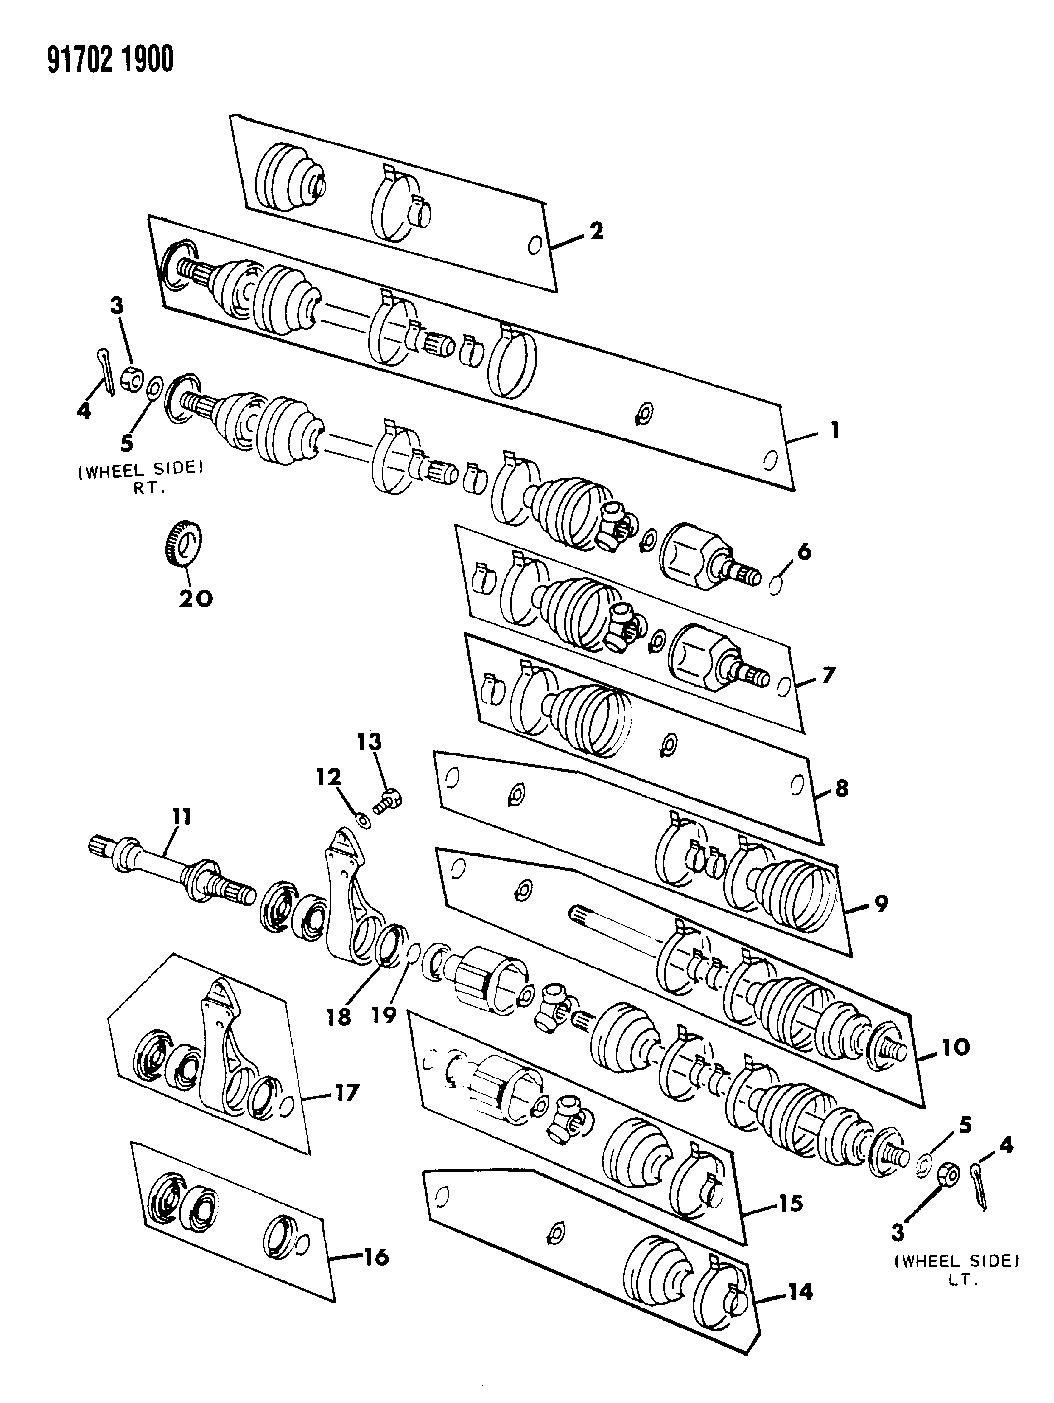 mb109025